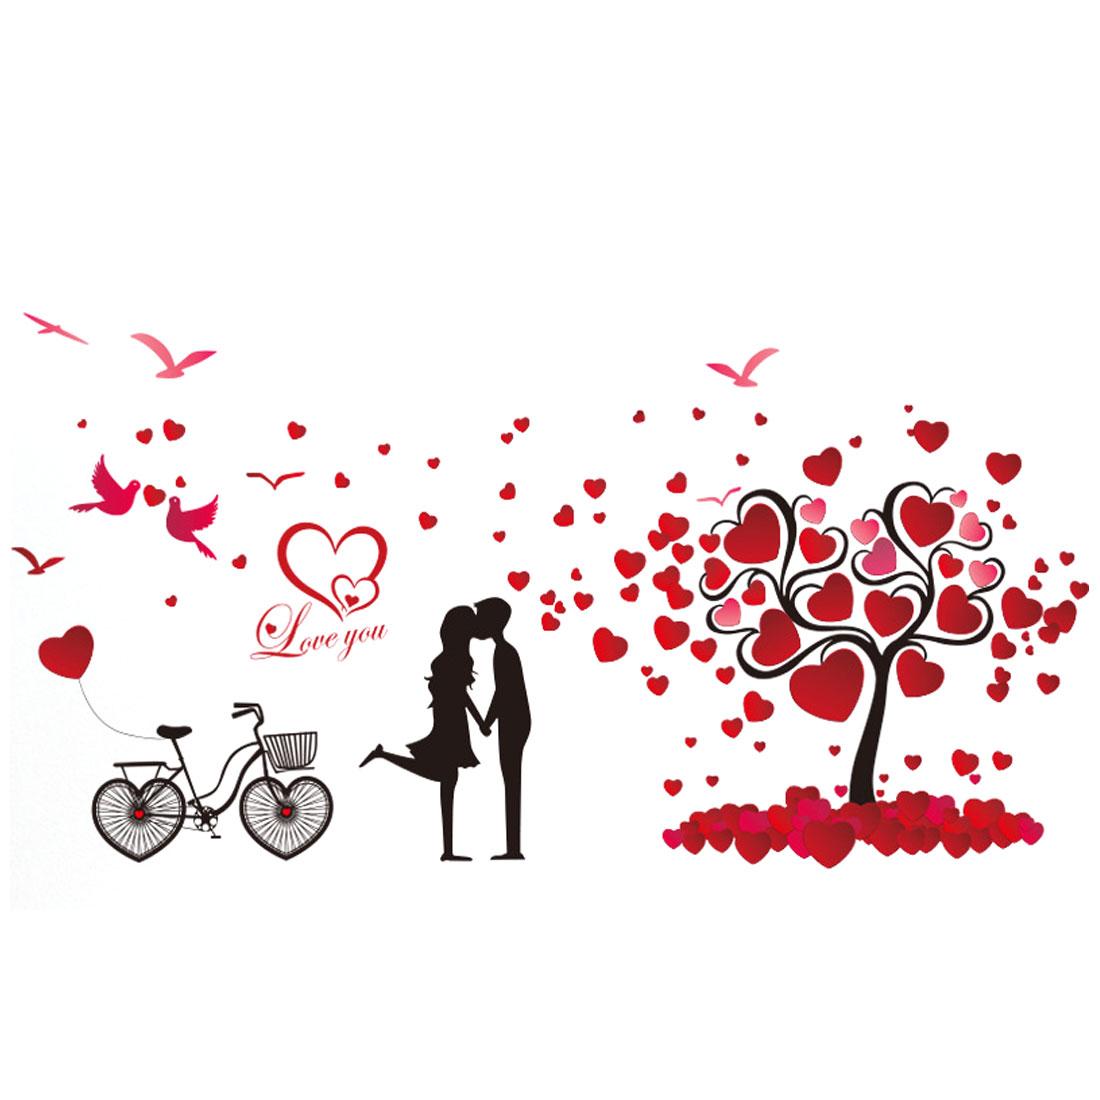 PVC Heart Bike Print Self-adhesive Window Film Protector Wall Sticker Red Black